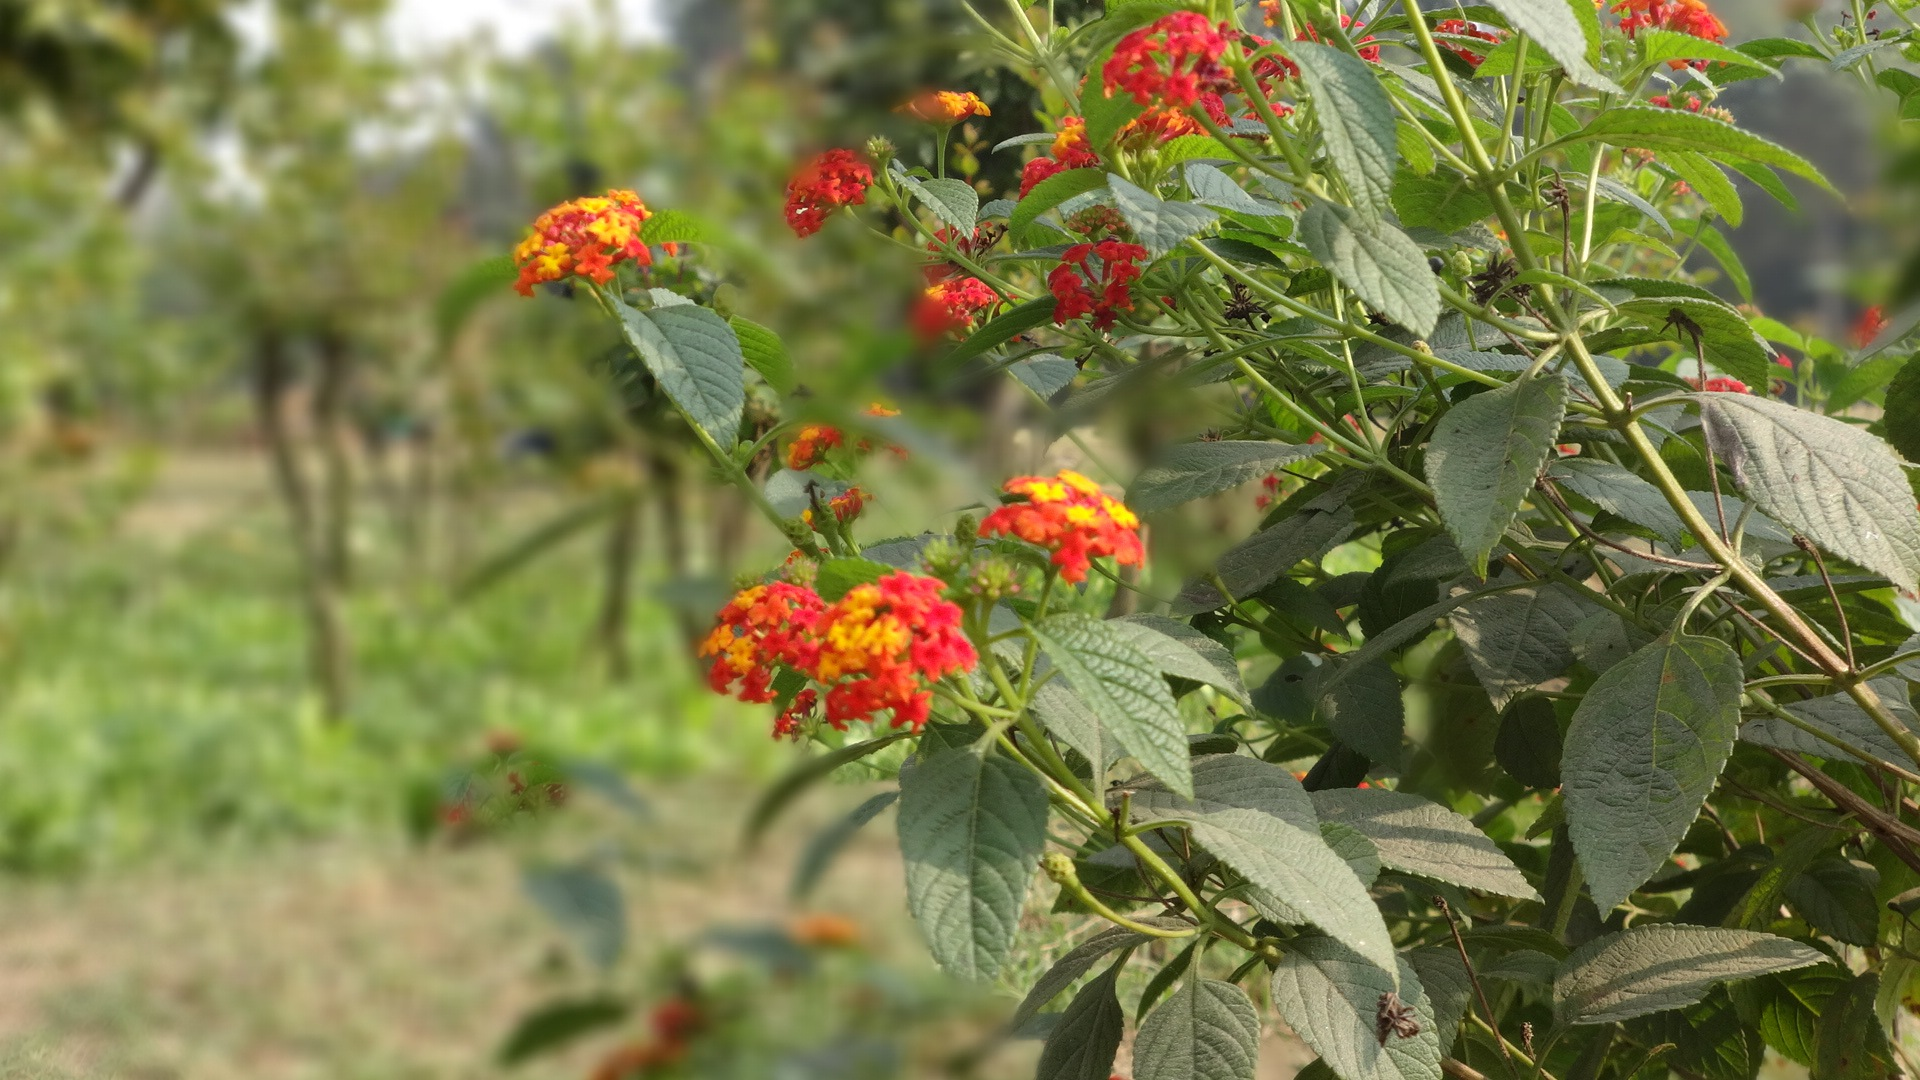 wild flower by Inddrani Kar